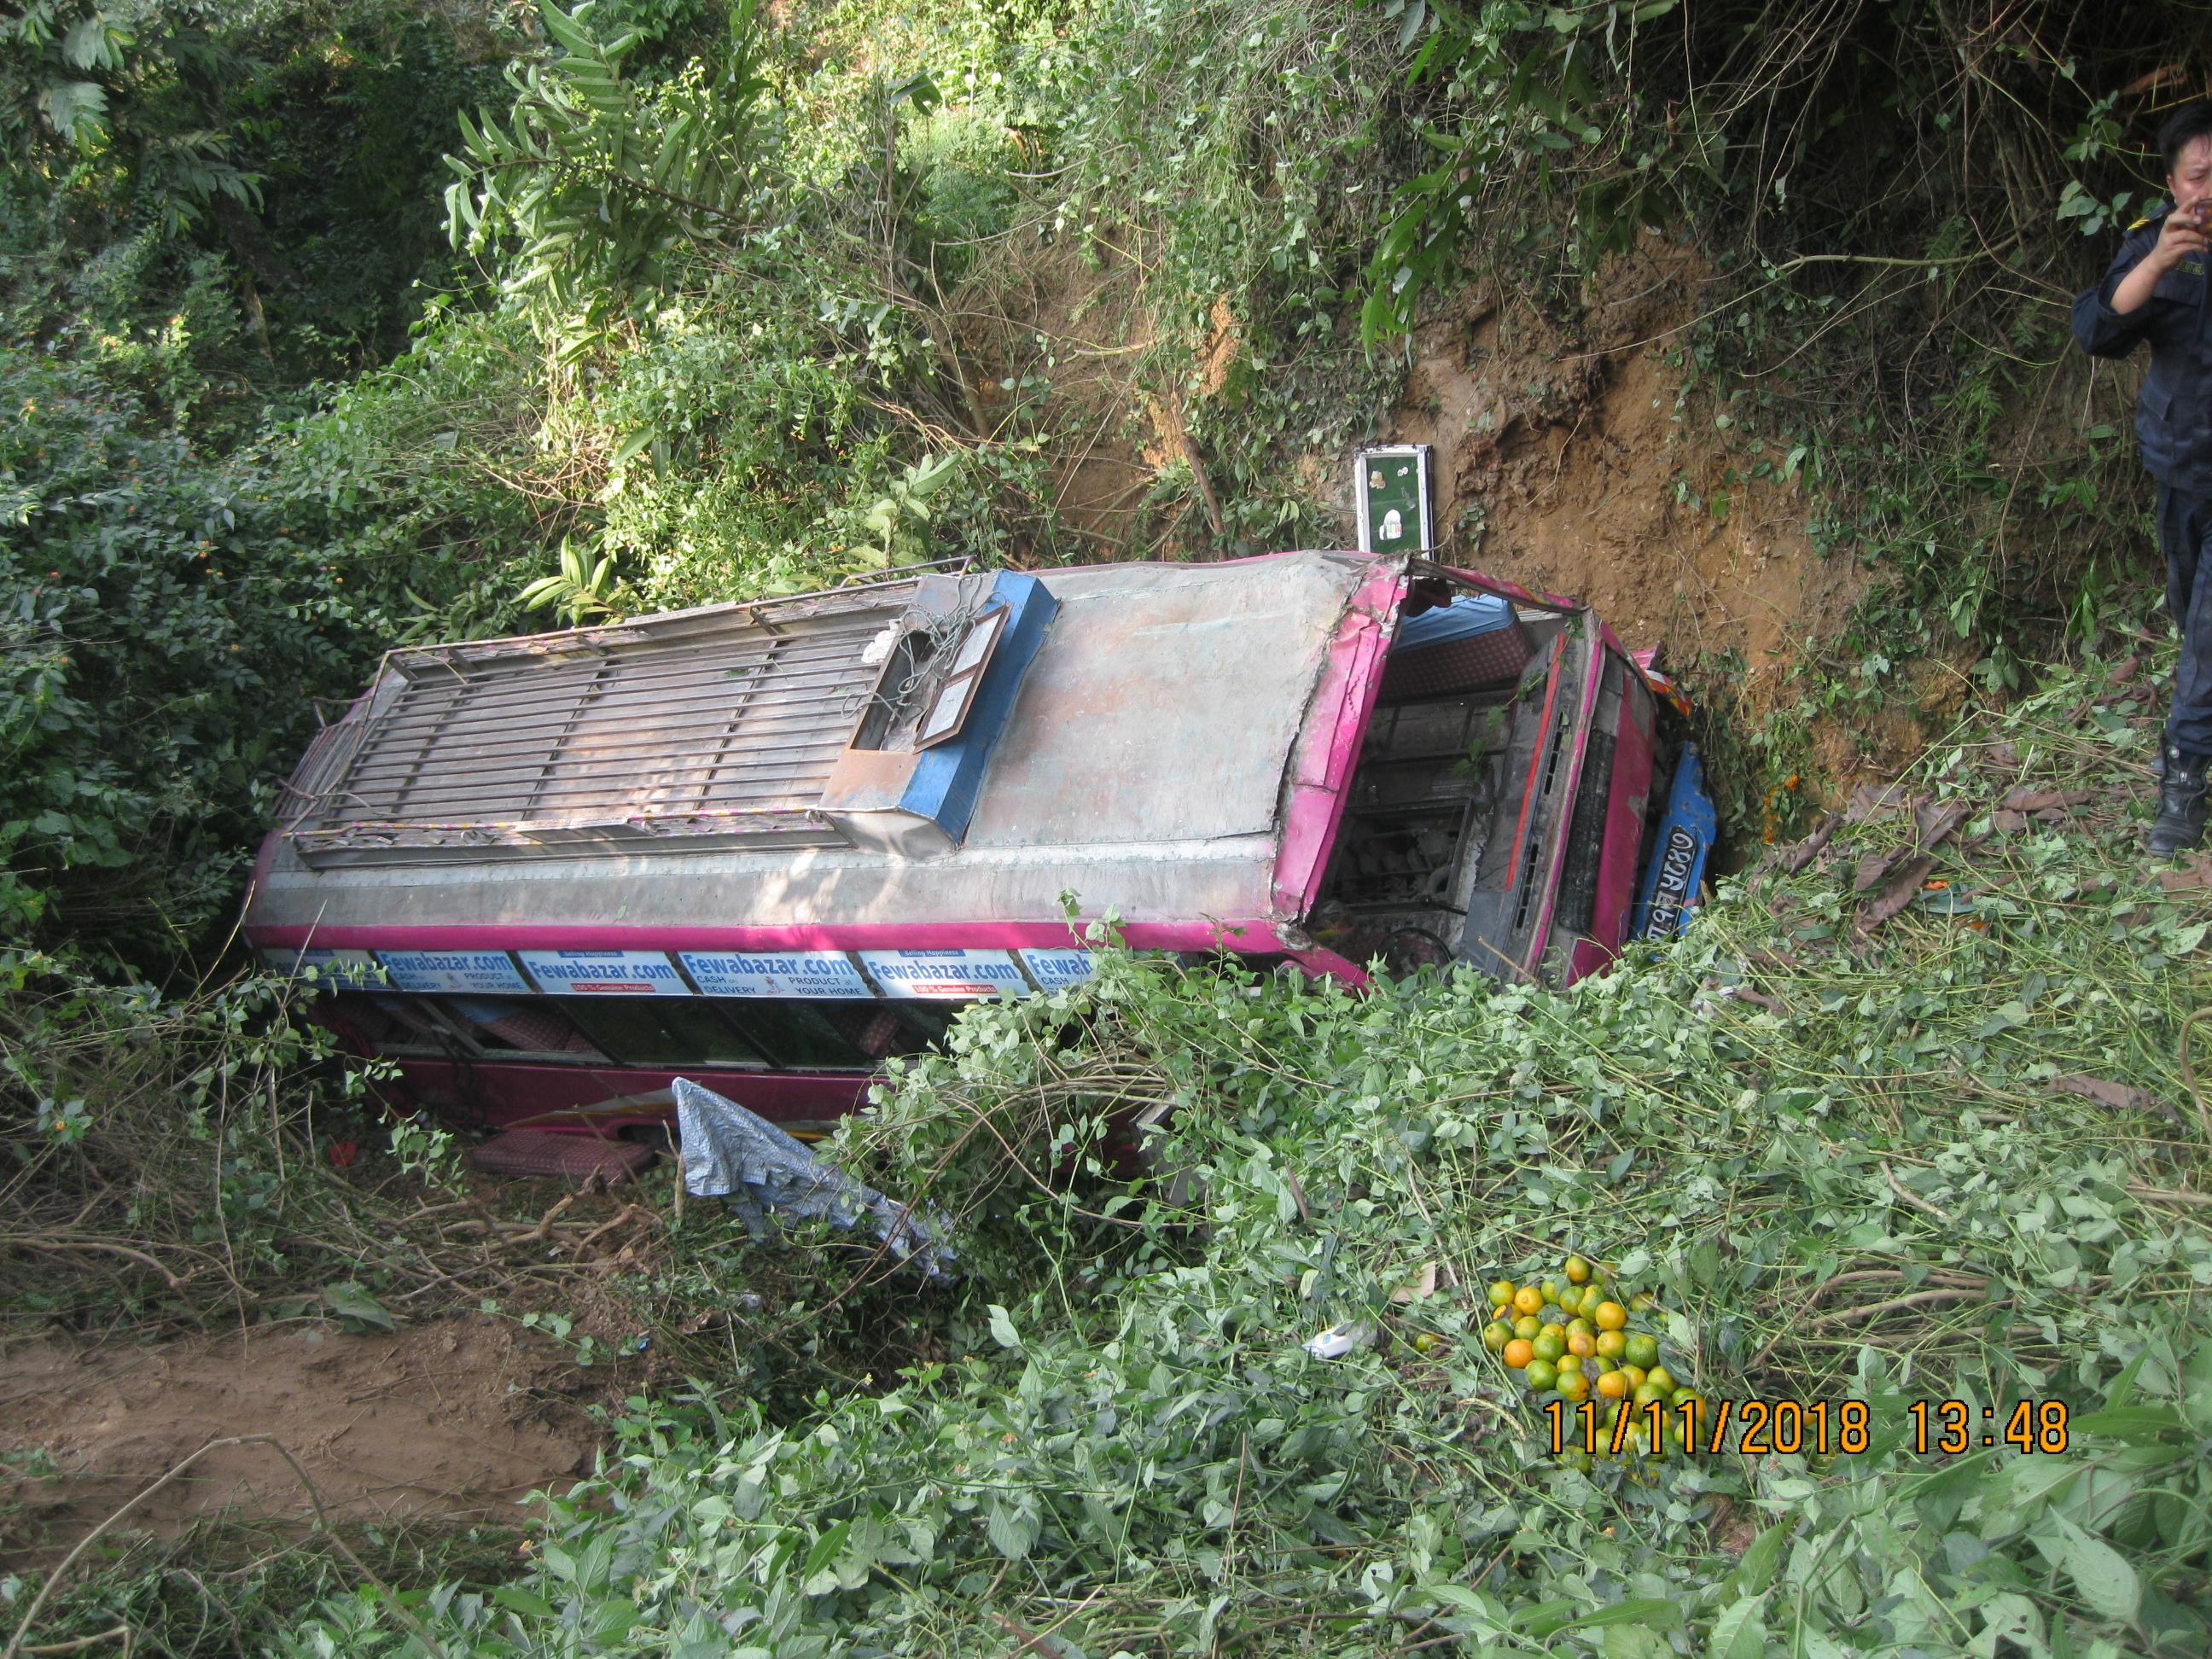 An overturned bus pictured at Kamalbari, on November 11, 2018. Photo: Madan Wagle/THT